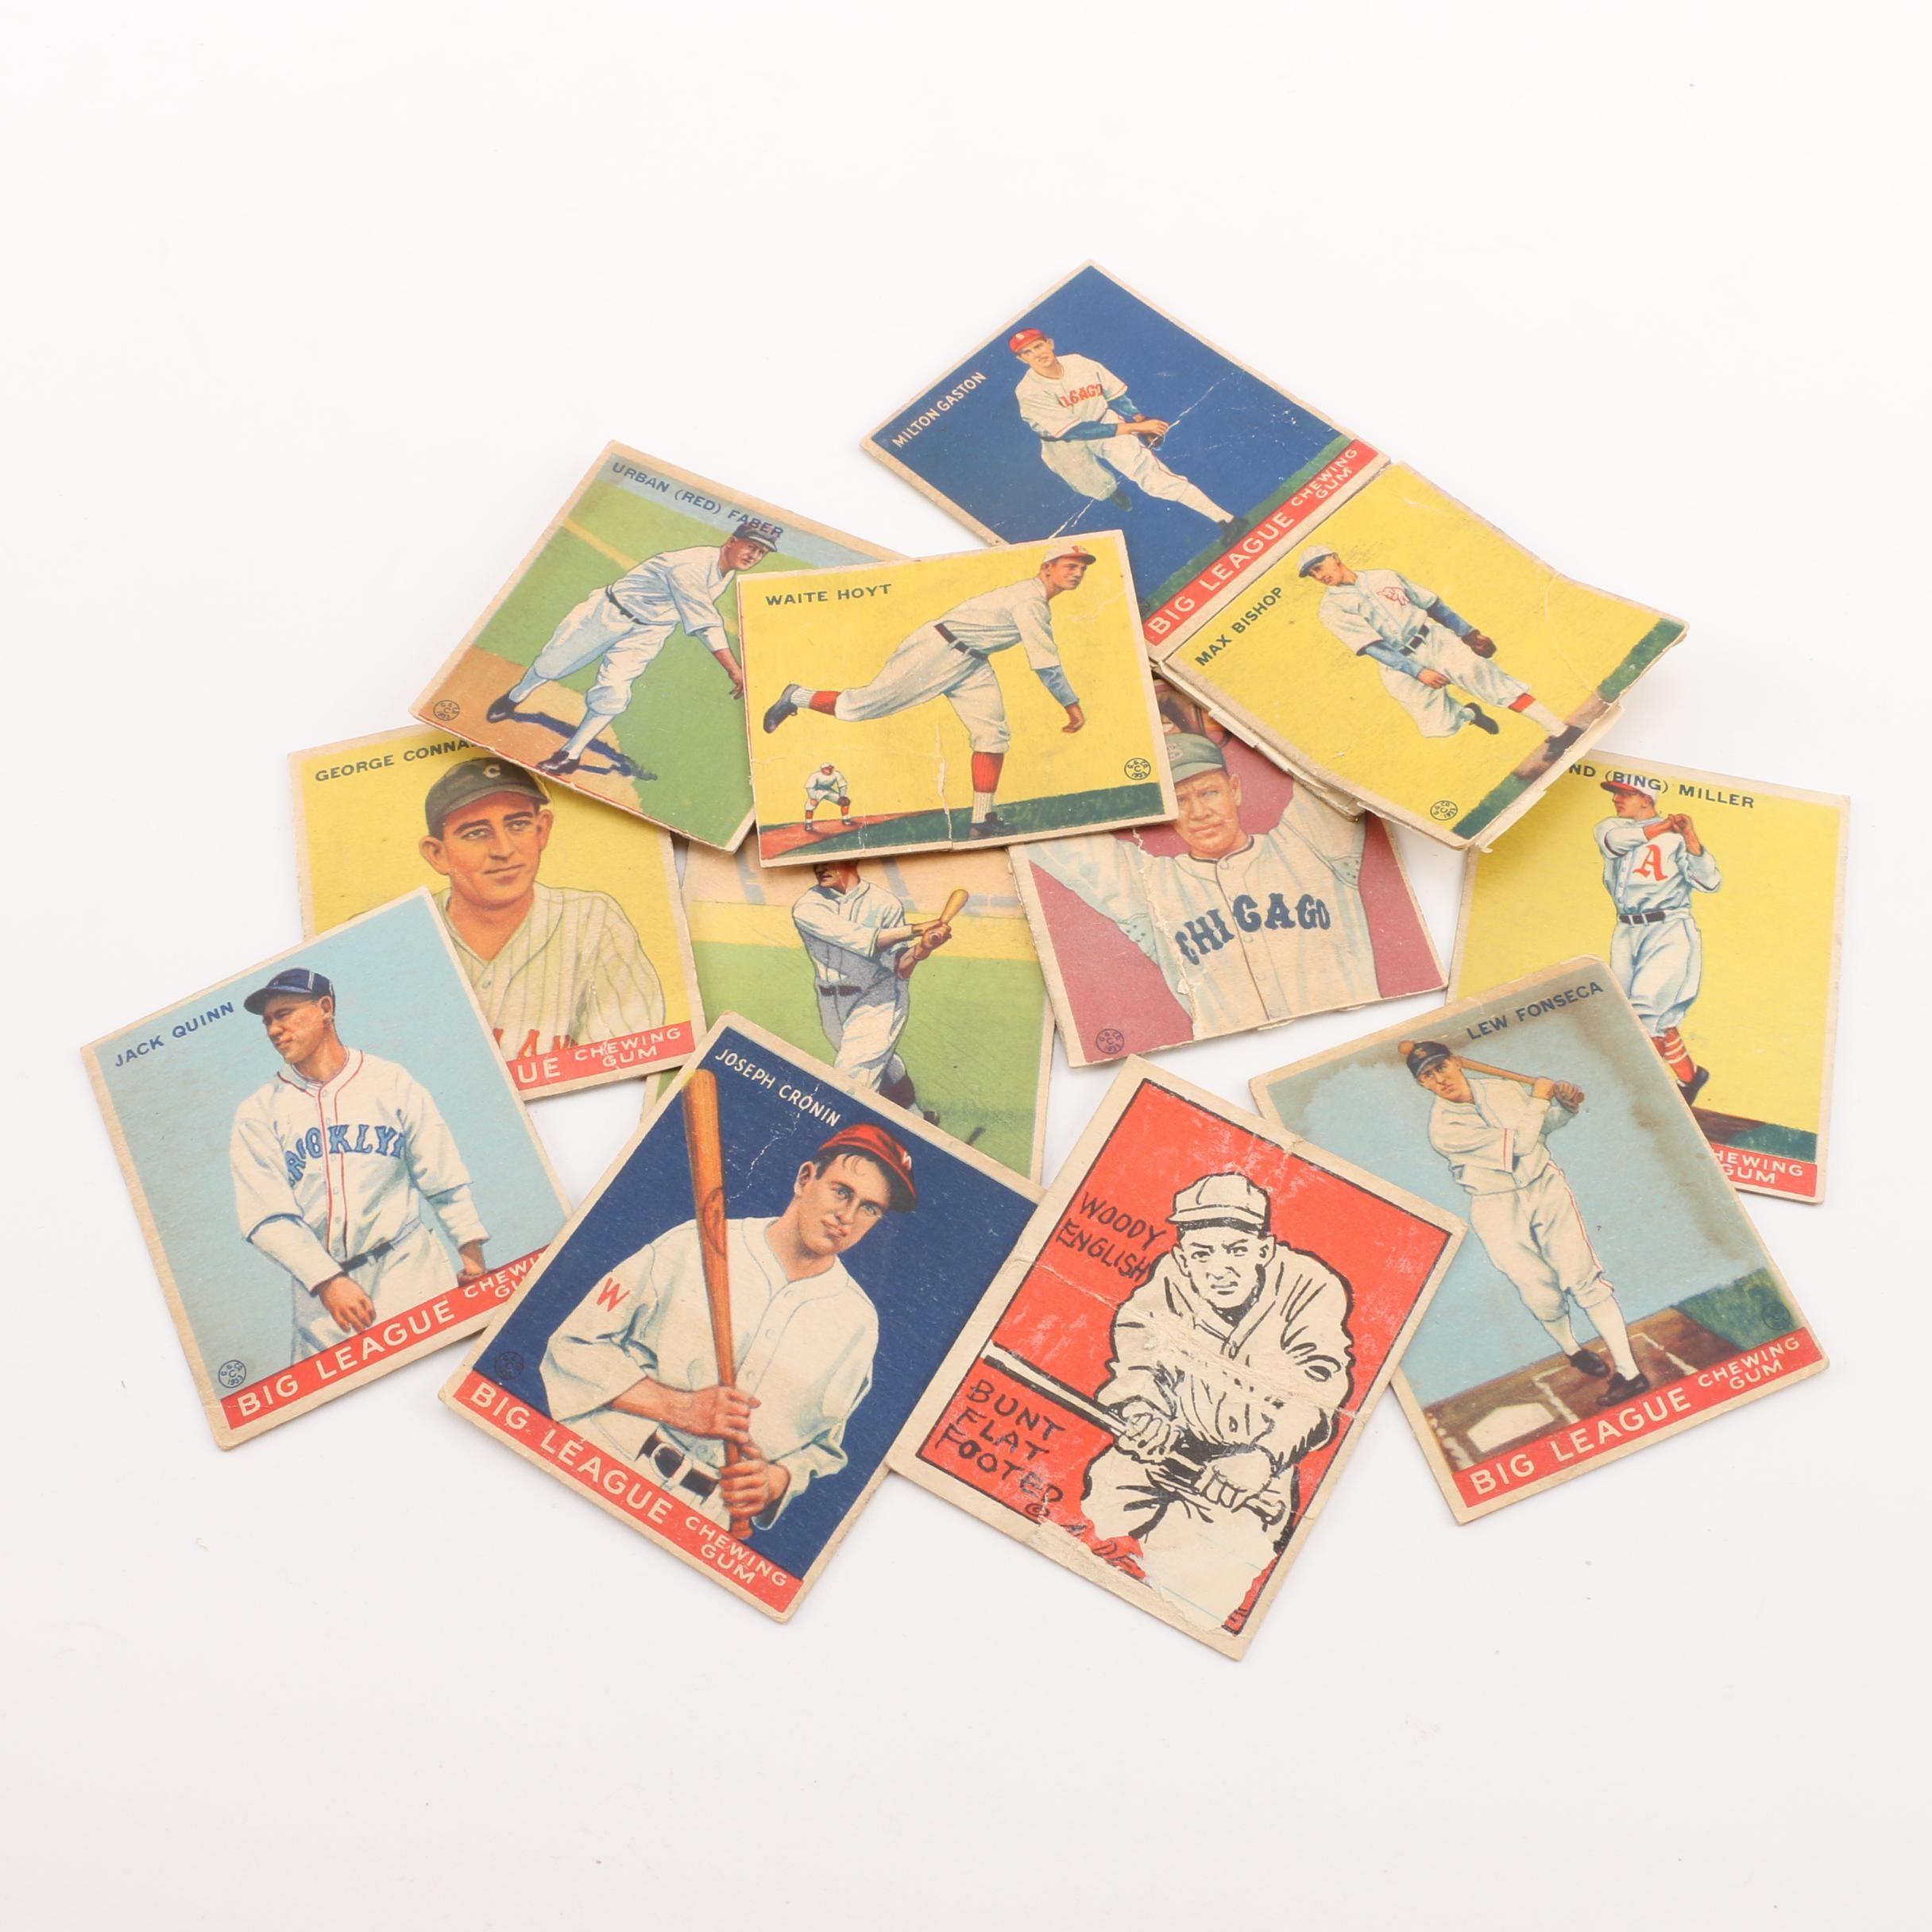 1933 Goudey Baseball Cards Including Waite Hoyt